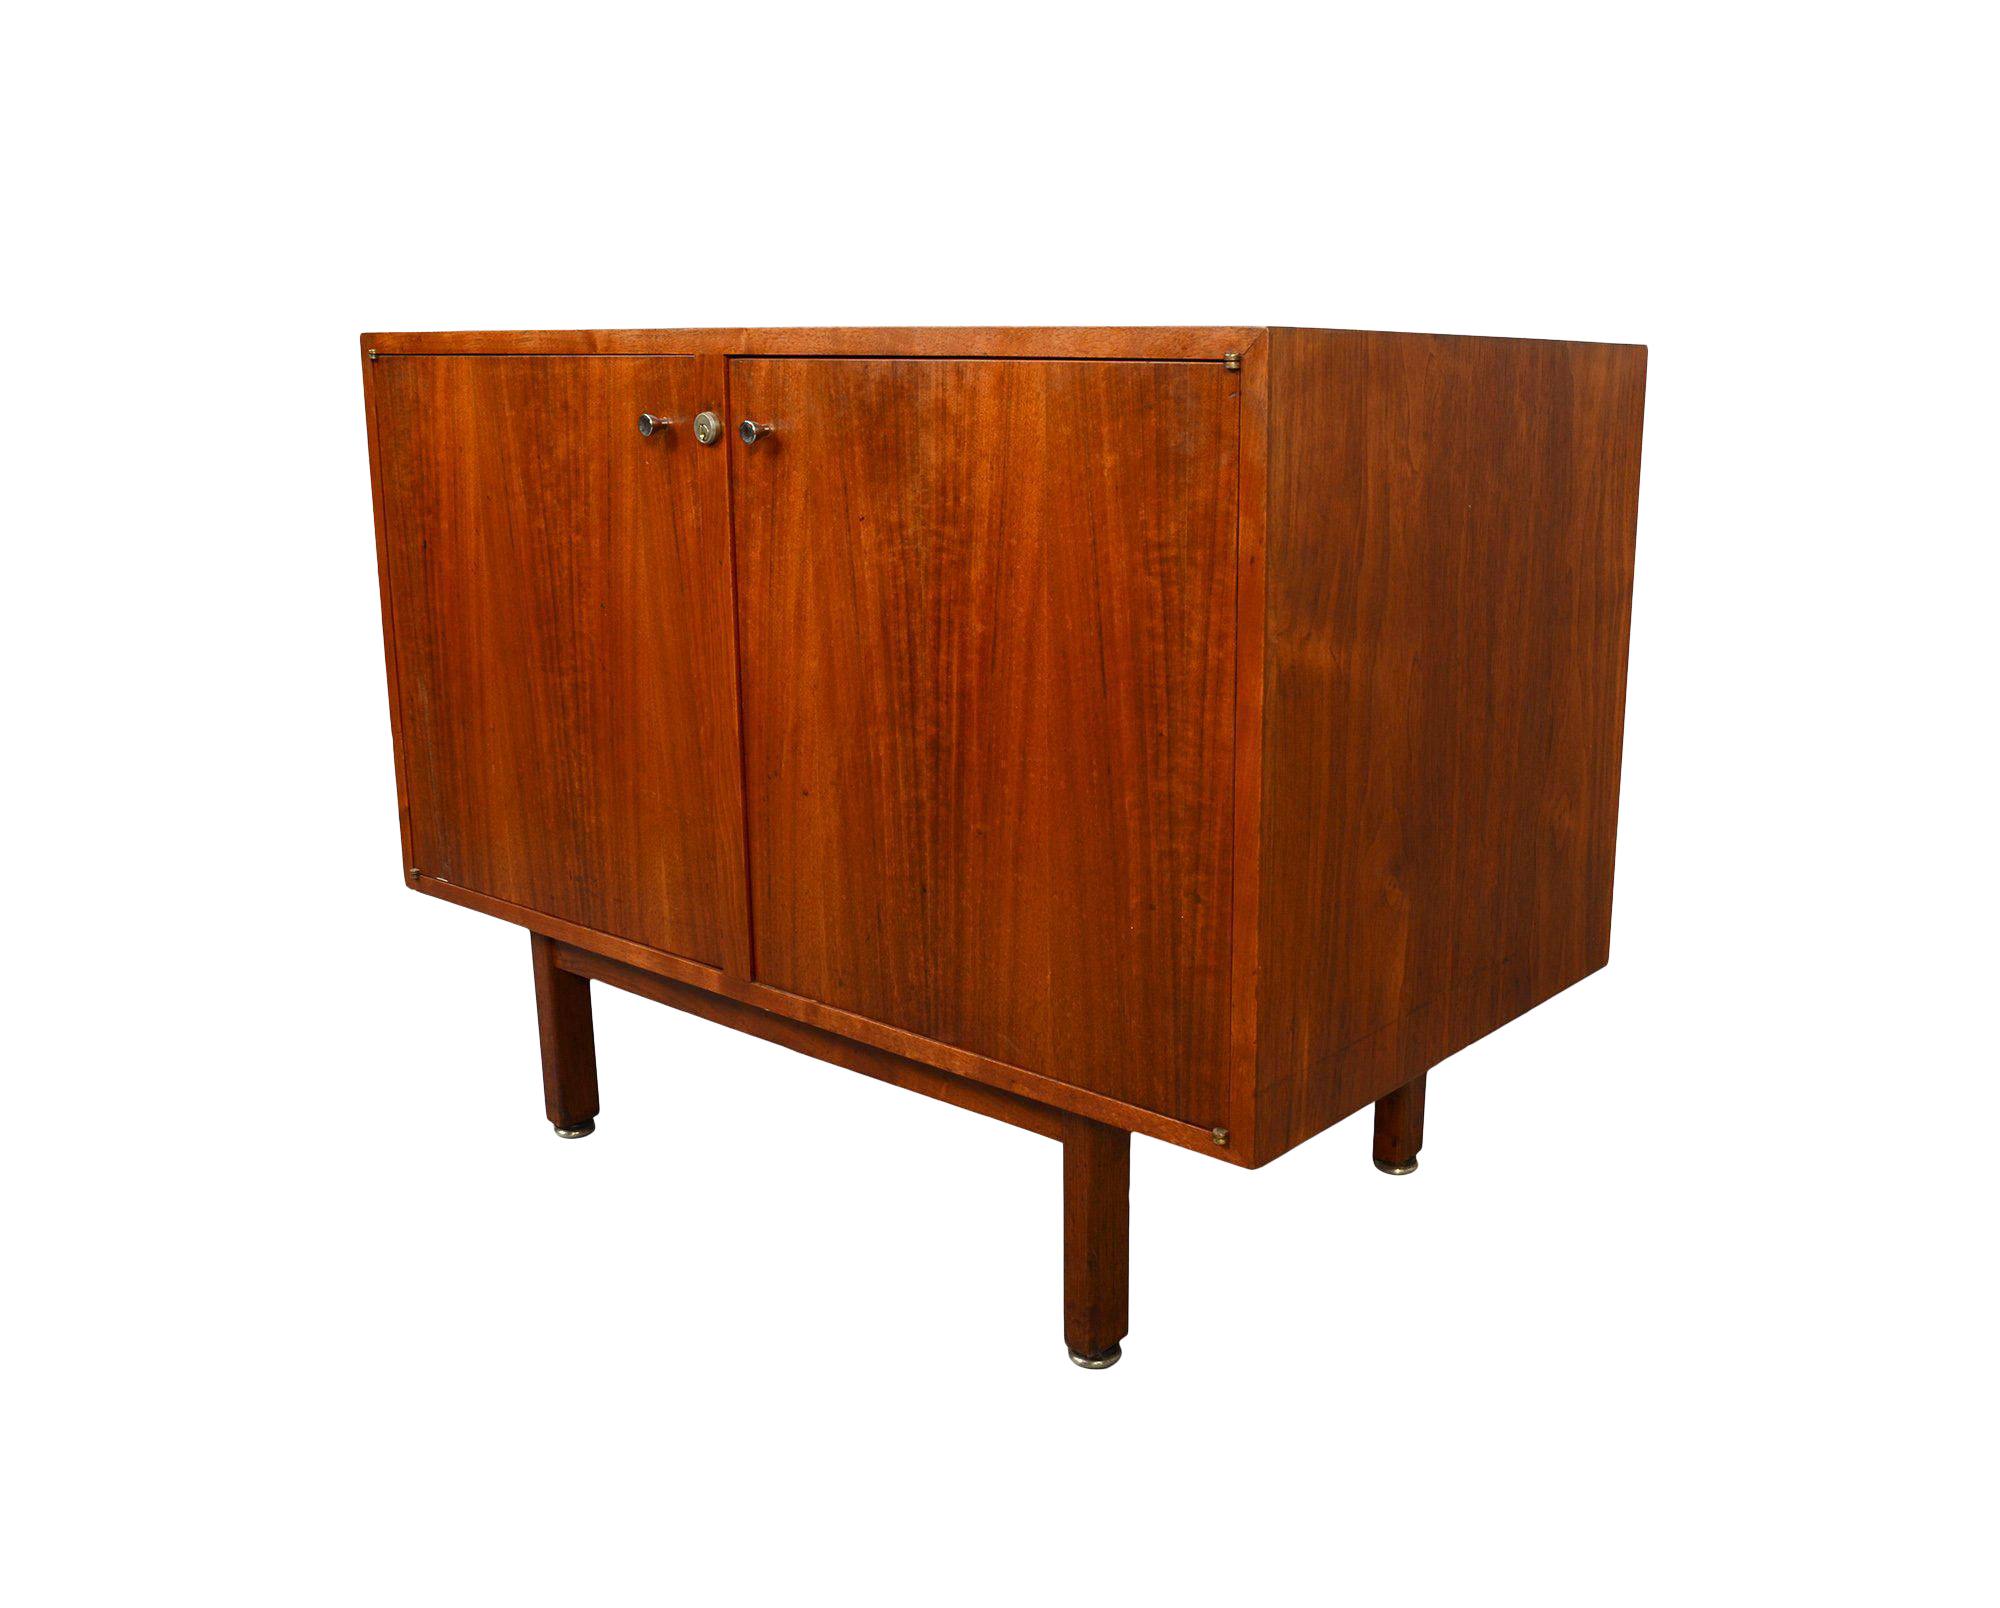 1960s mid century modern walnut bar cabinet credenza entertainment unit chairish